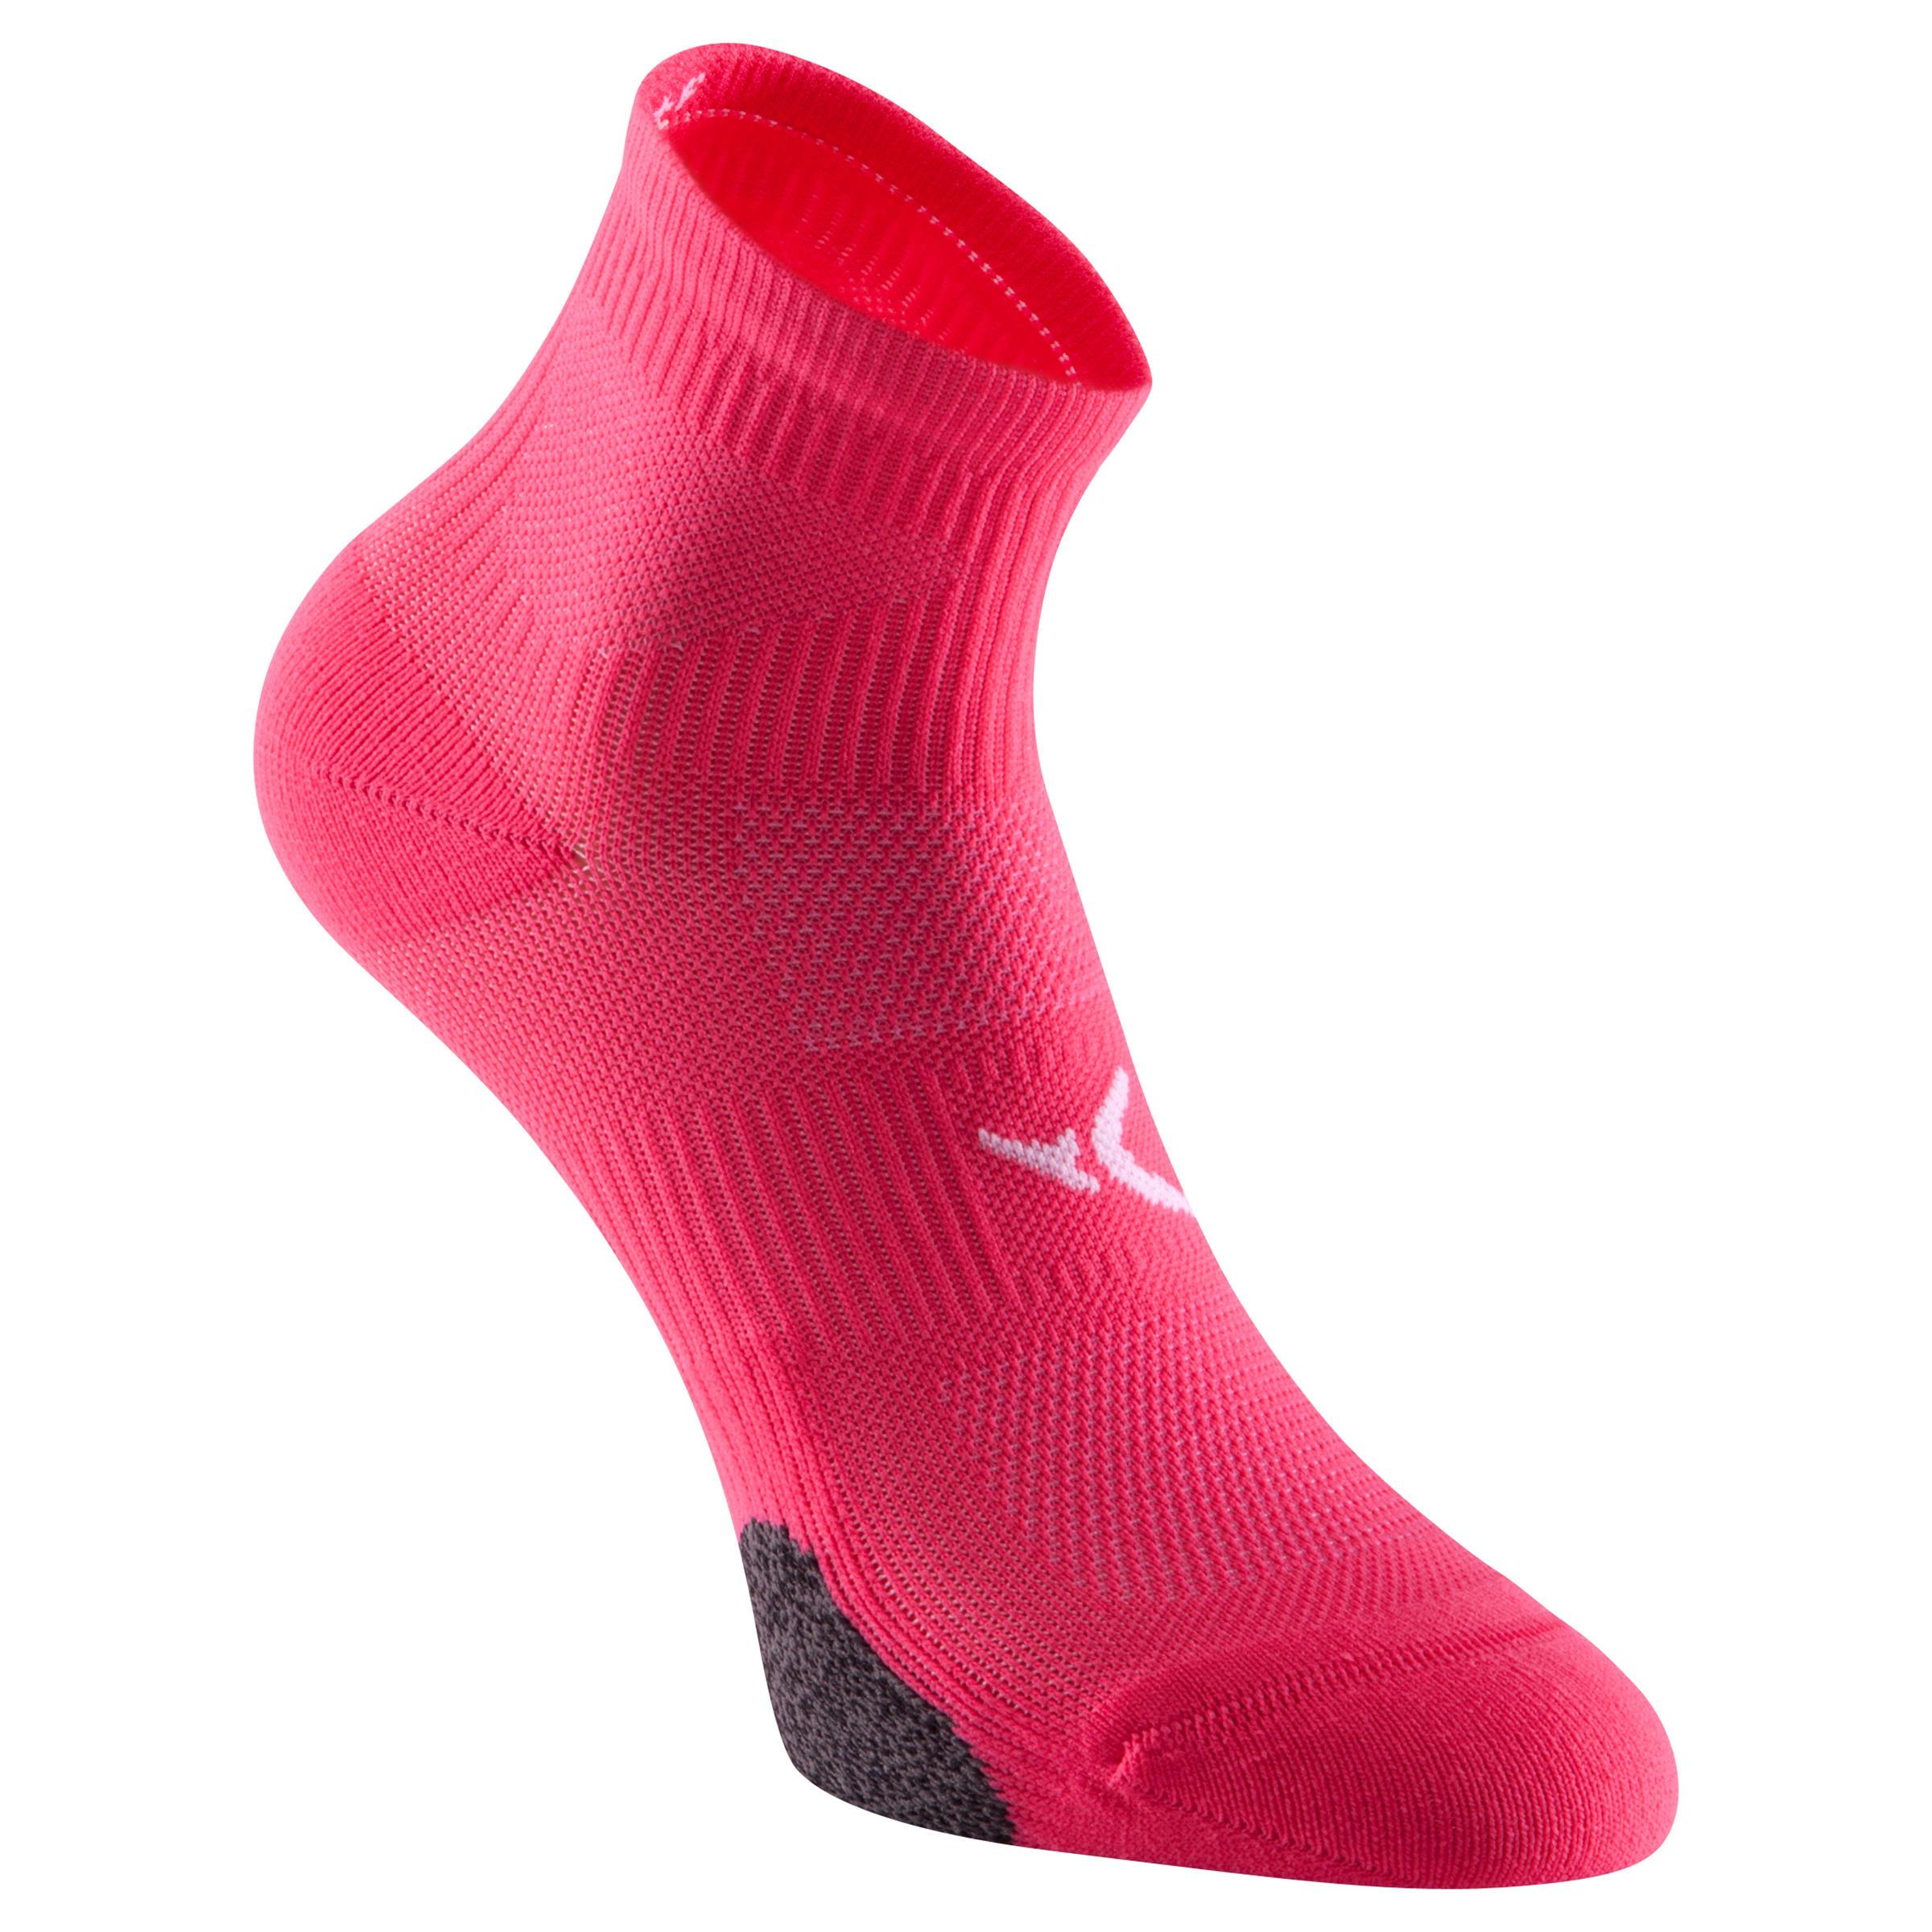 Sportsocken kurz Fitness 2er-Pack Erwachsene rosa | Sportbekleidung > Funktionswäsche | Domyos